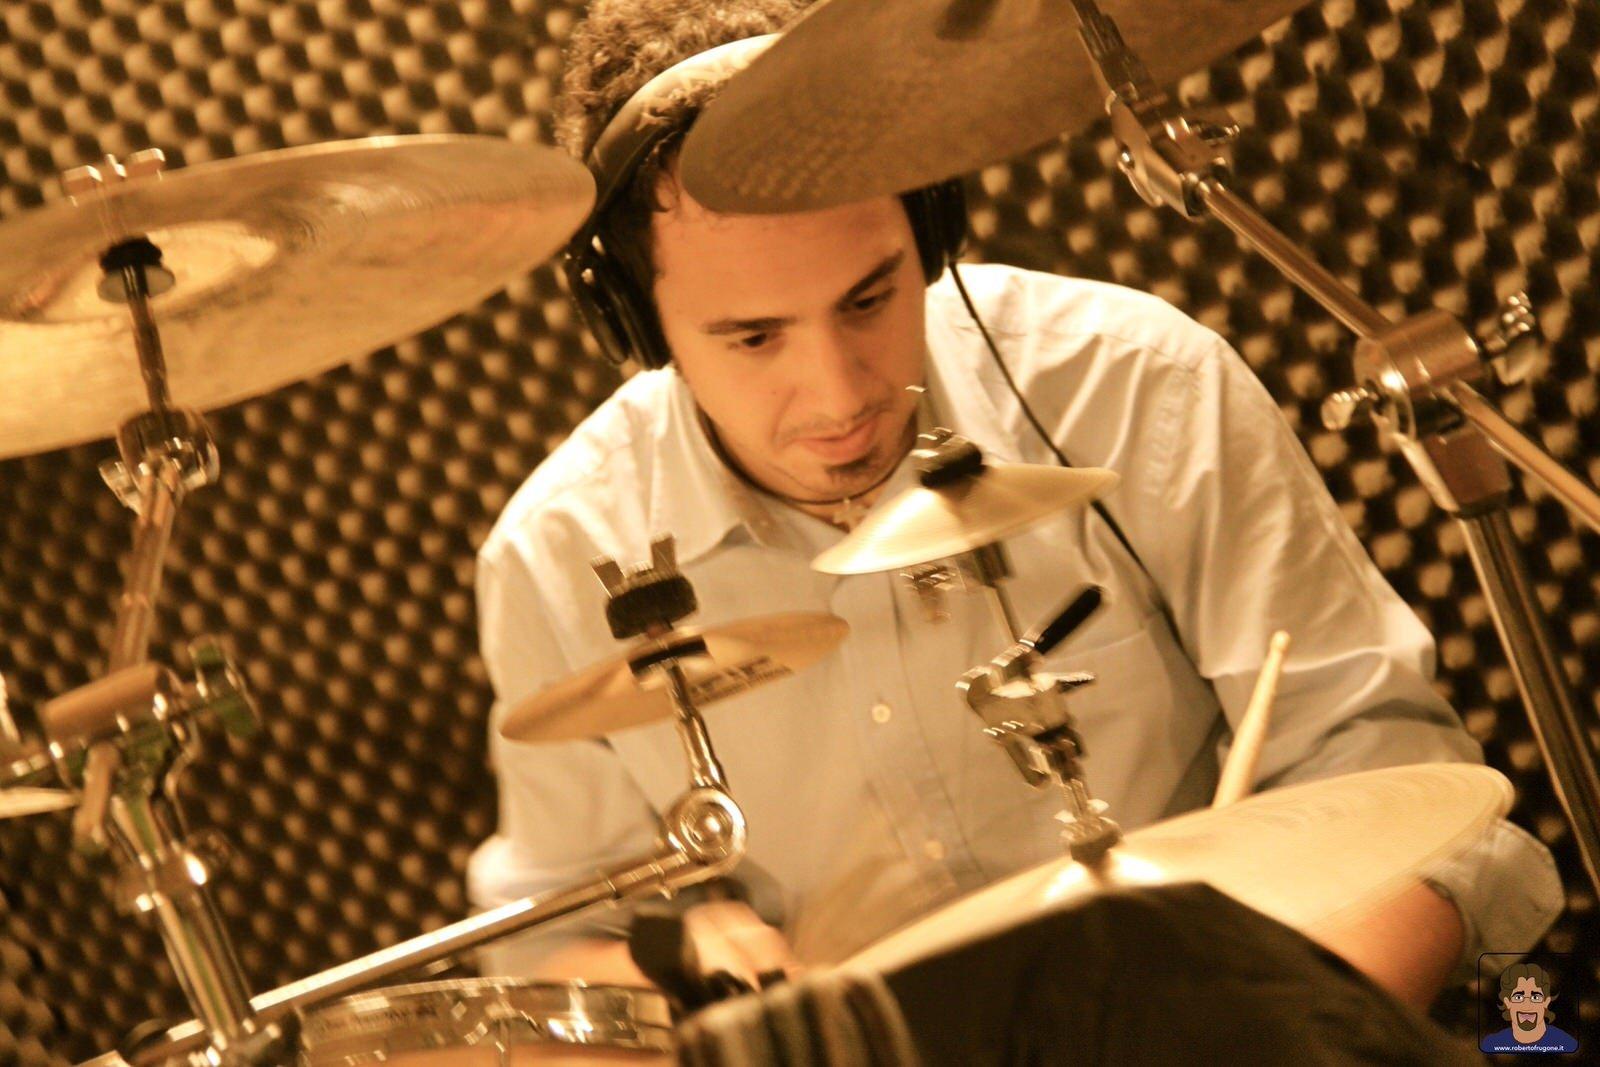 Totem Studio Sala Prove Musicali Casarza Ligure Luca Laurino batteria